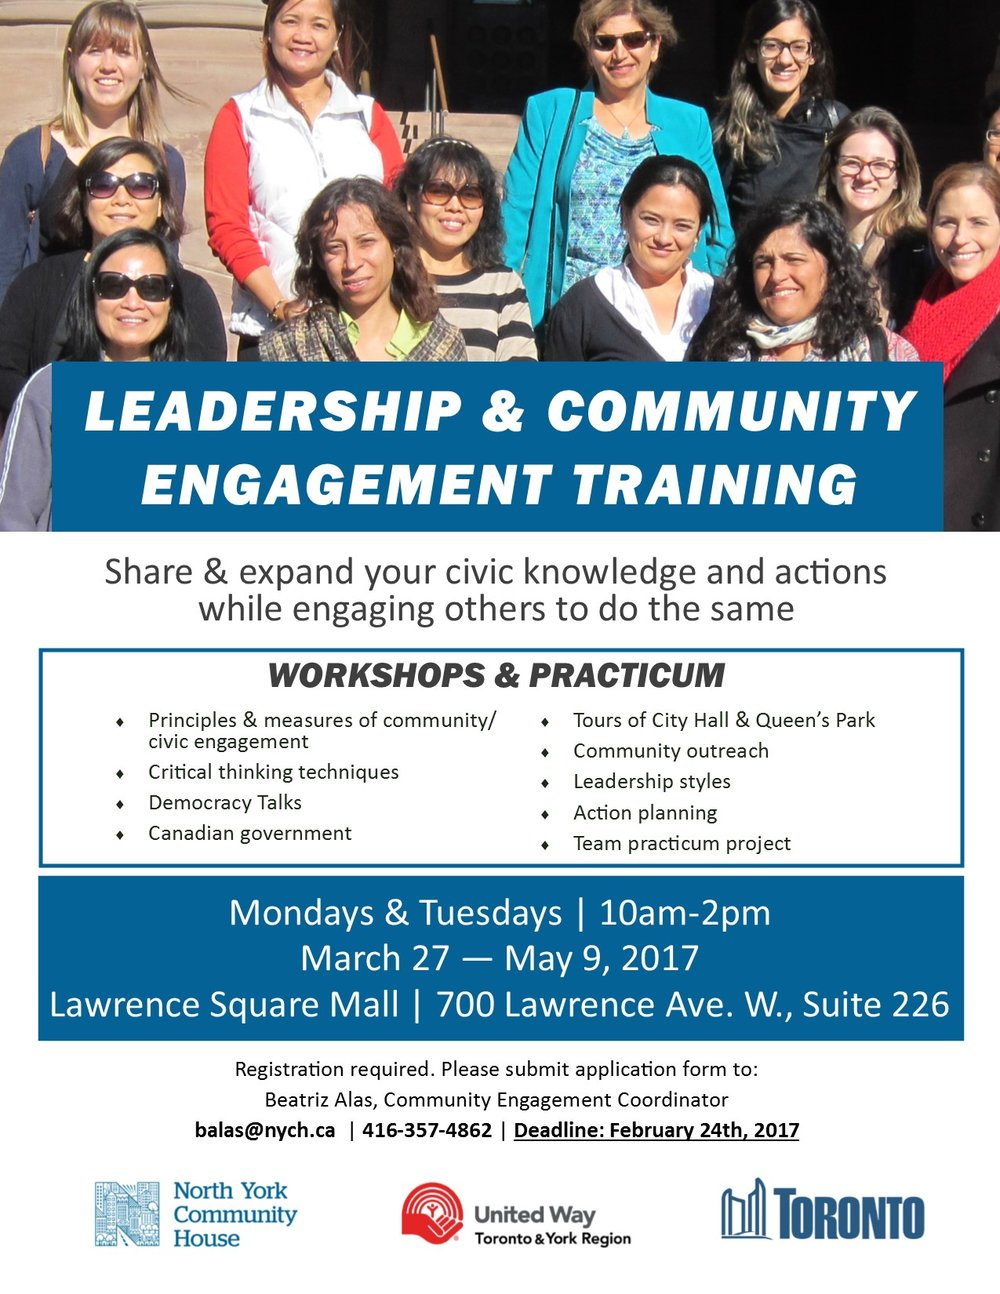 Leadership & Community Engagement Training flyer